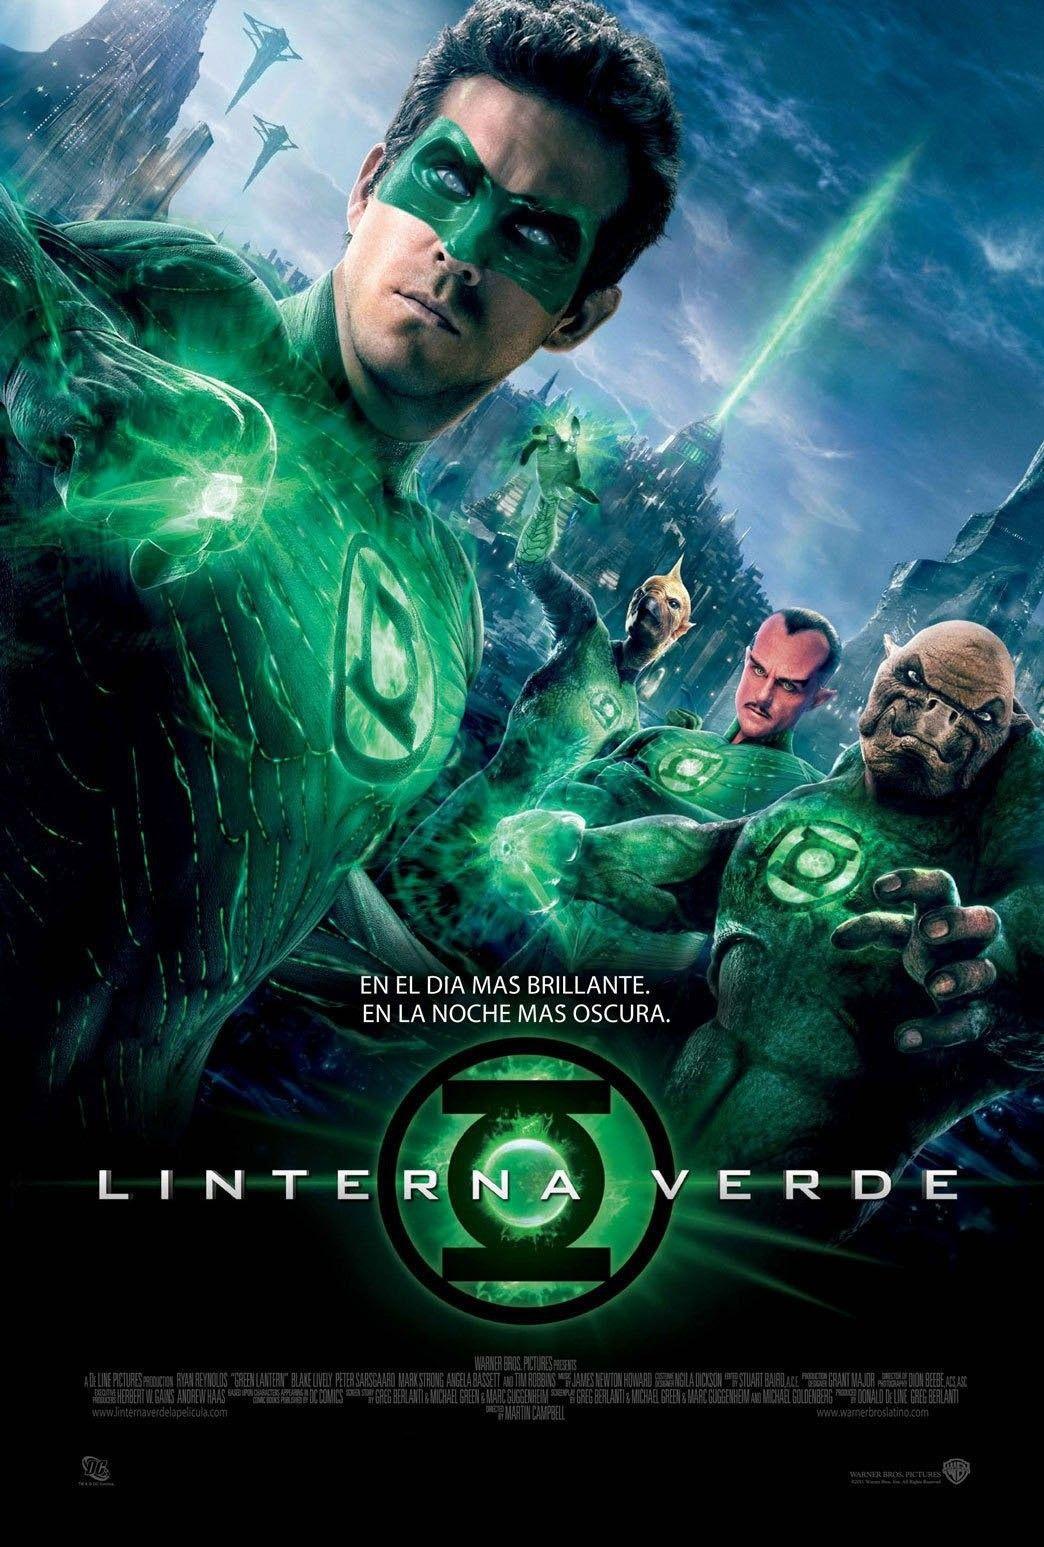 Ver Linterna Verde Online Gratis 2011 Hd Pelicula Completa Espanol Green Lantern Movie Green Lantern Green Lantern Film